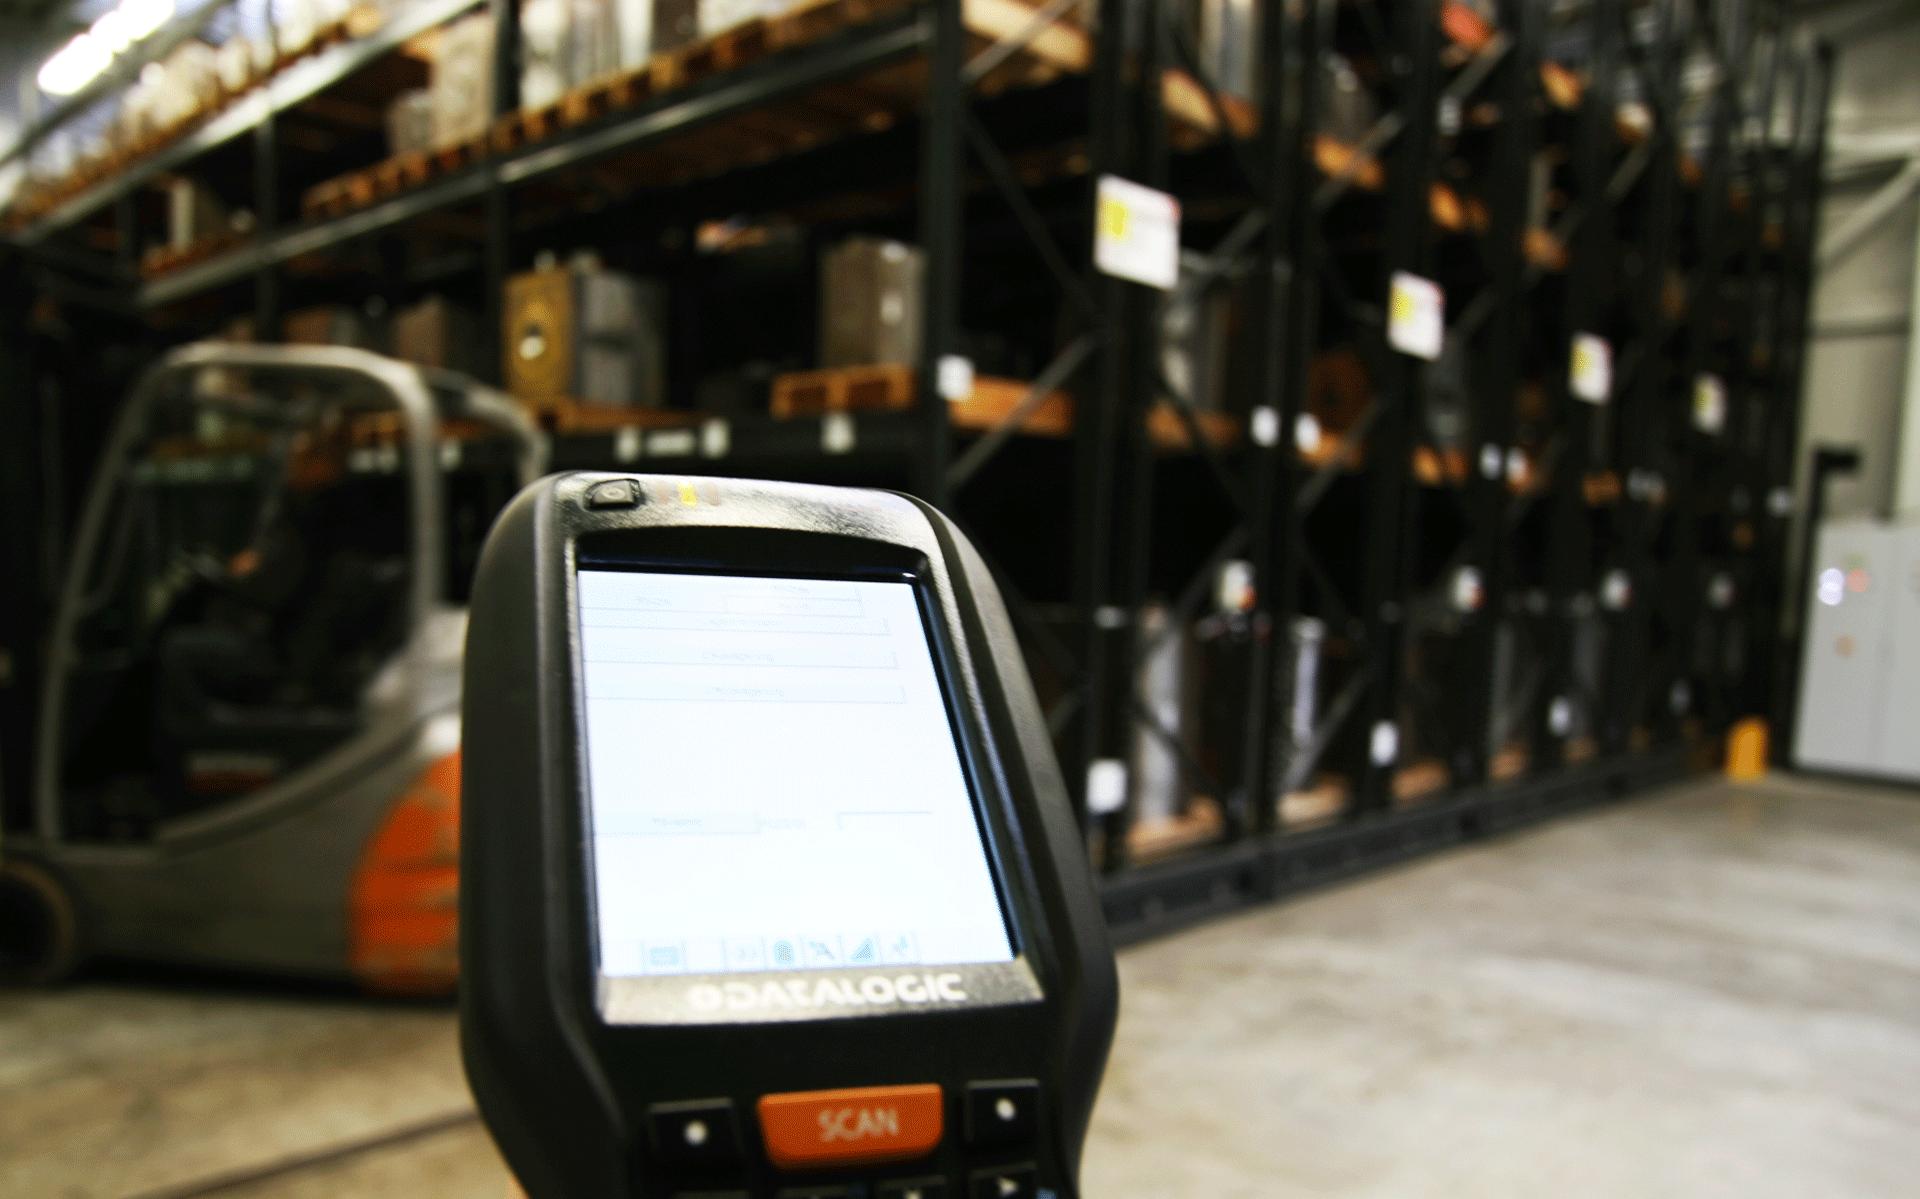 Bürener Maschinenfabrik GmbH